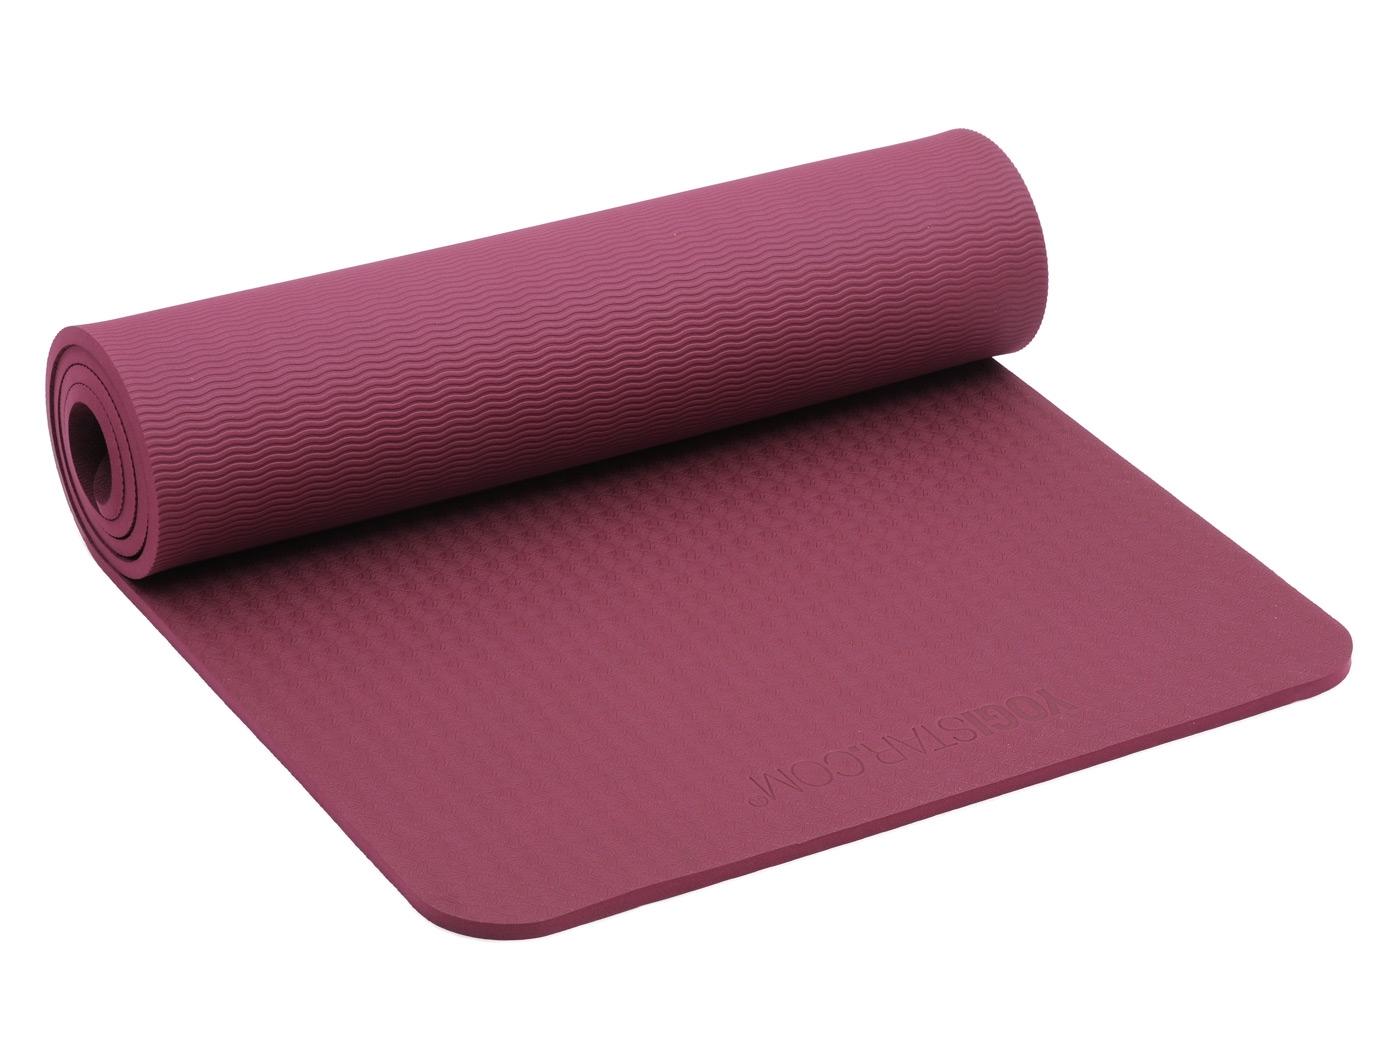 Pilates Mat Pro Buy Online At Yogistar Com Yoga